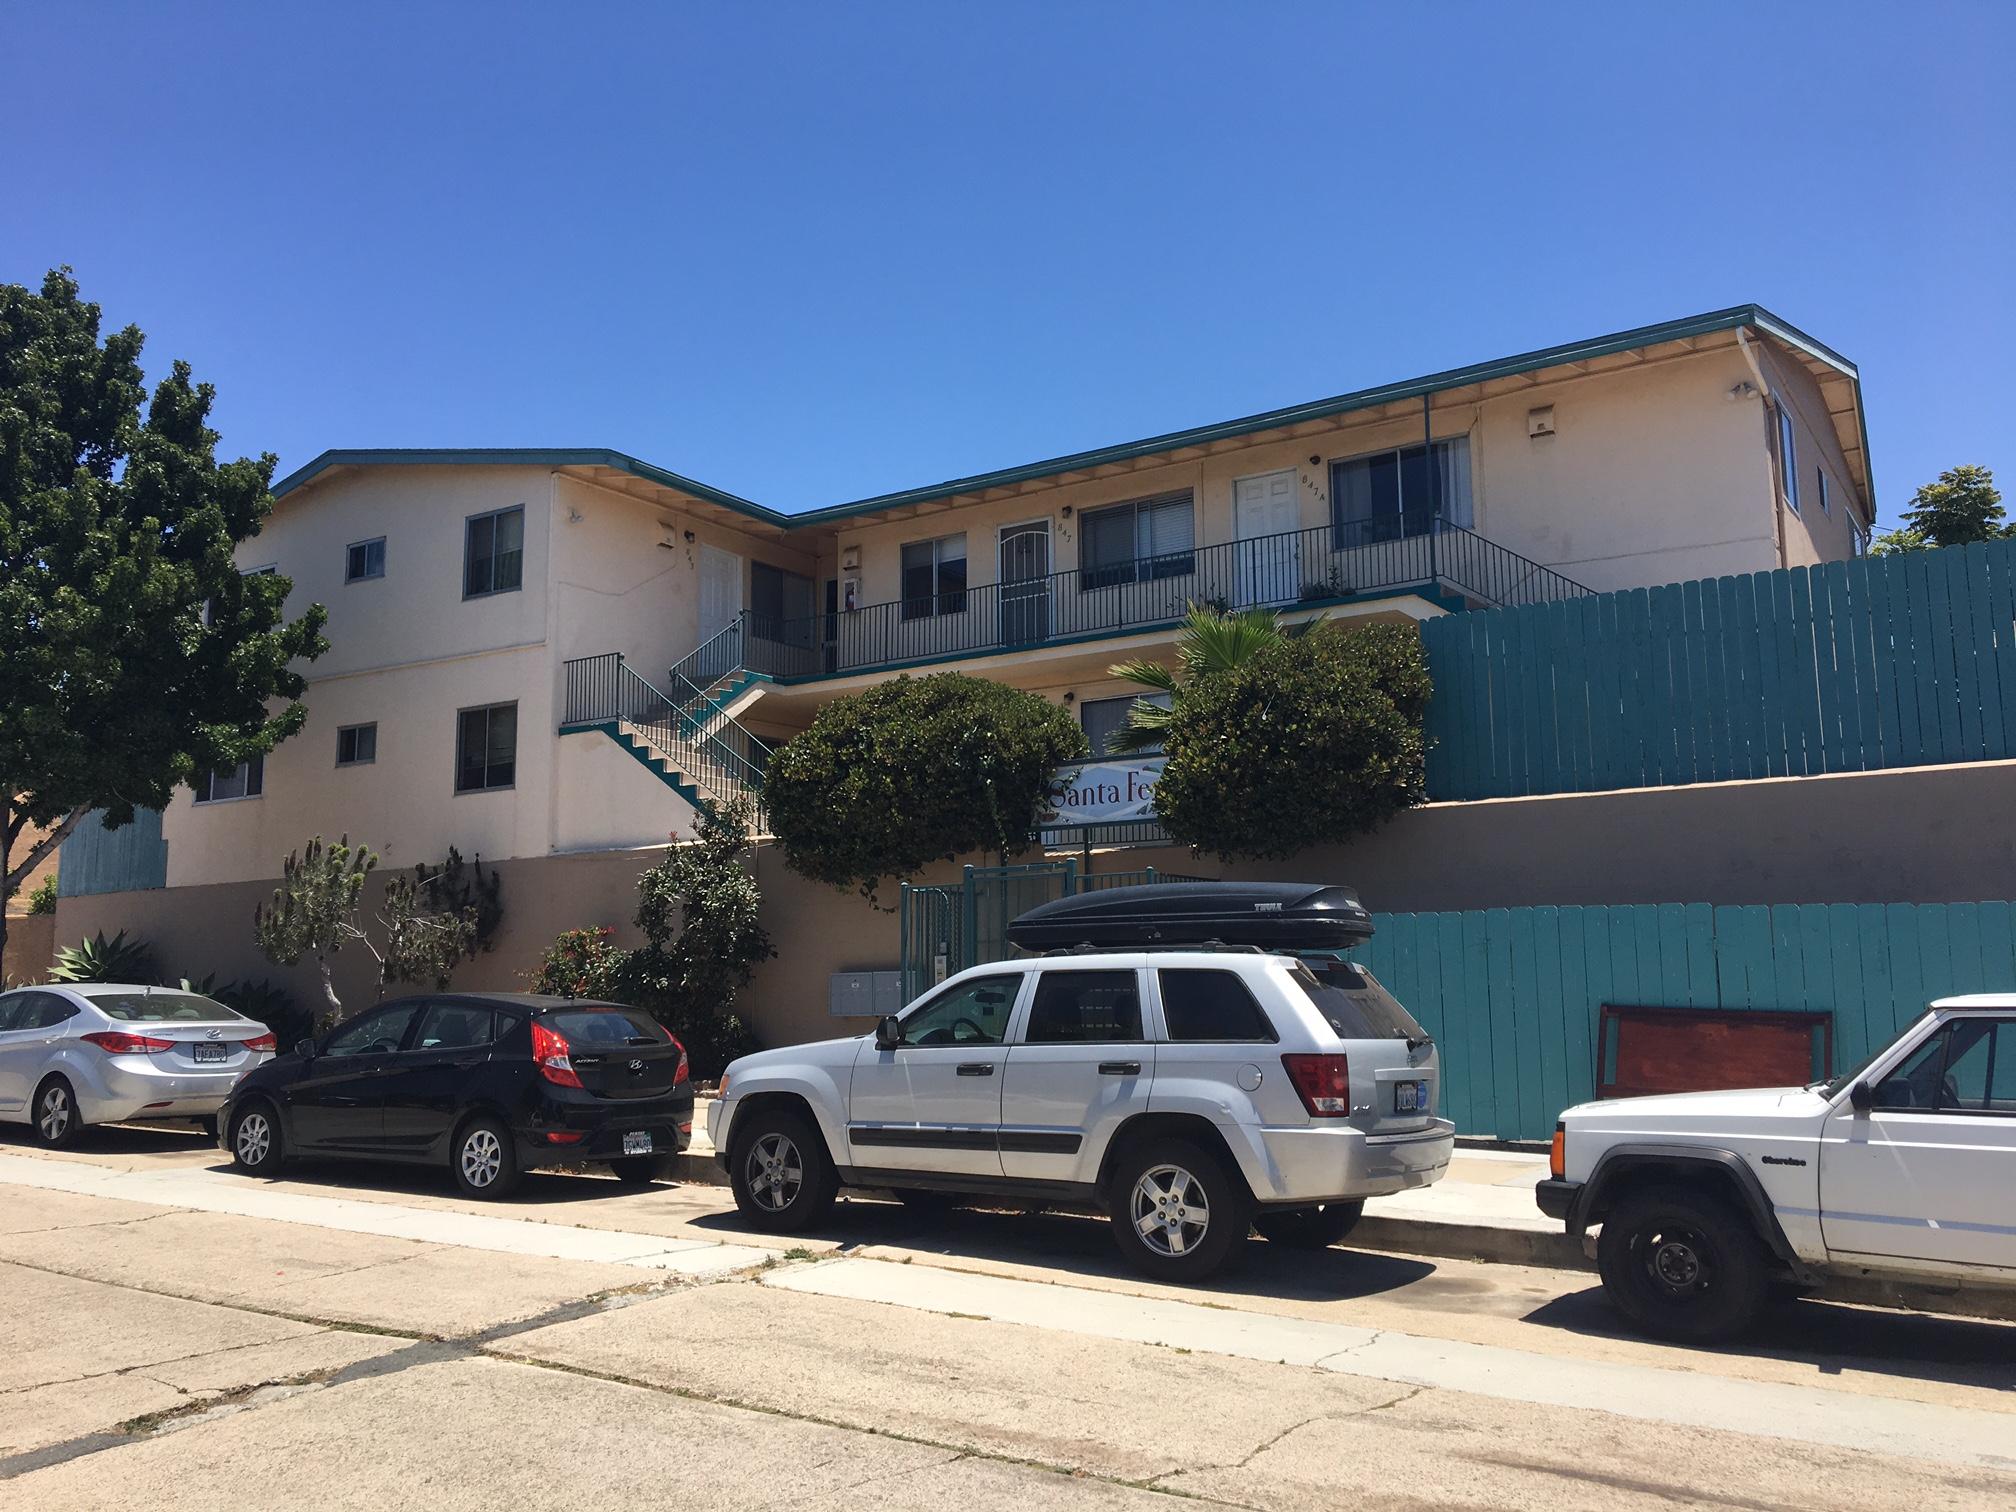 835 27th Street - Golden Hill7 Units$2,072,500